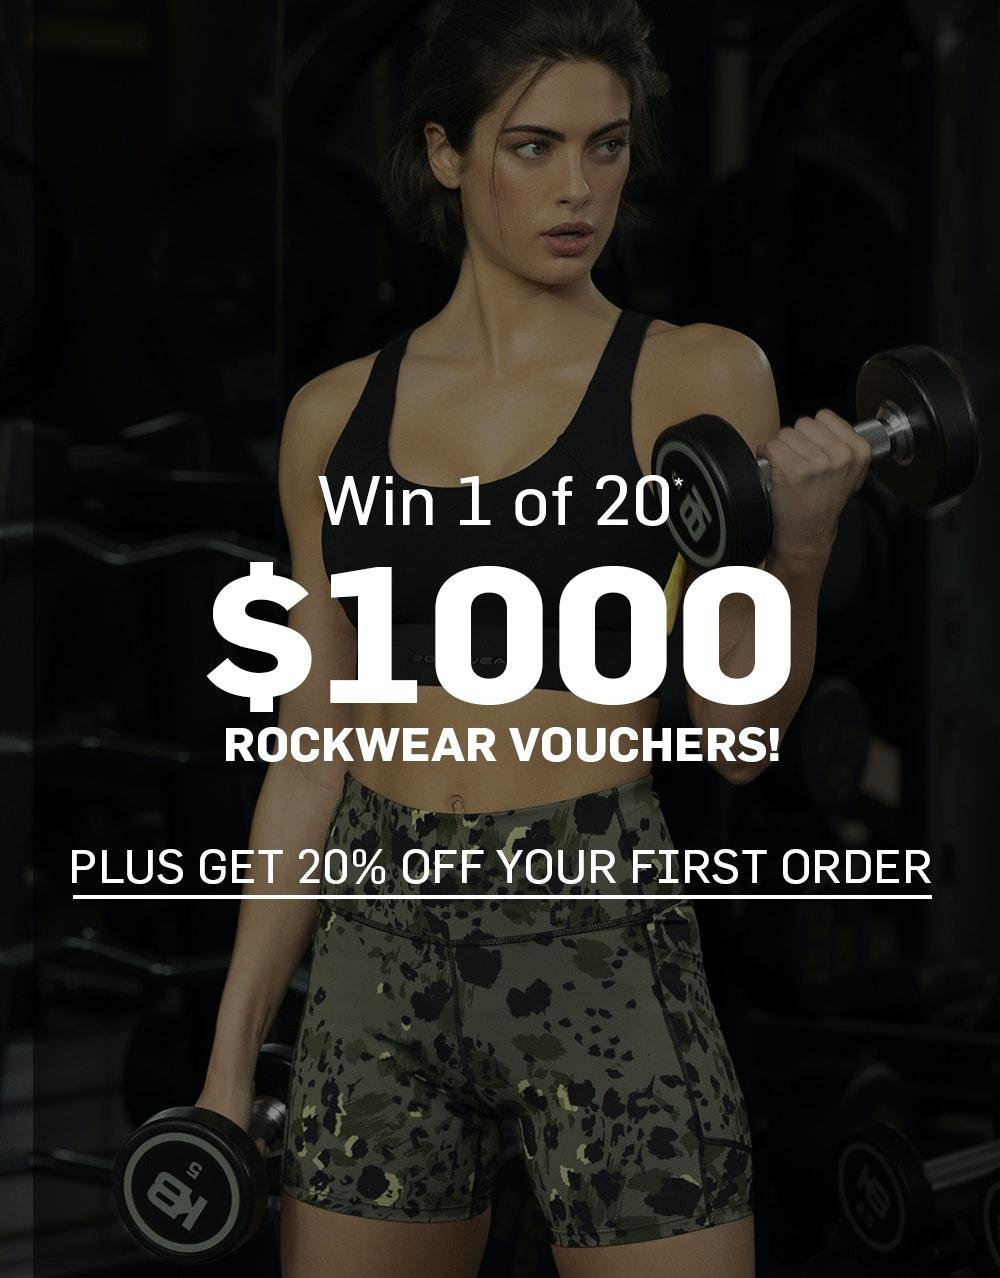 Rockwear Newsletter Subscription